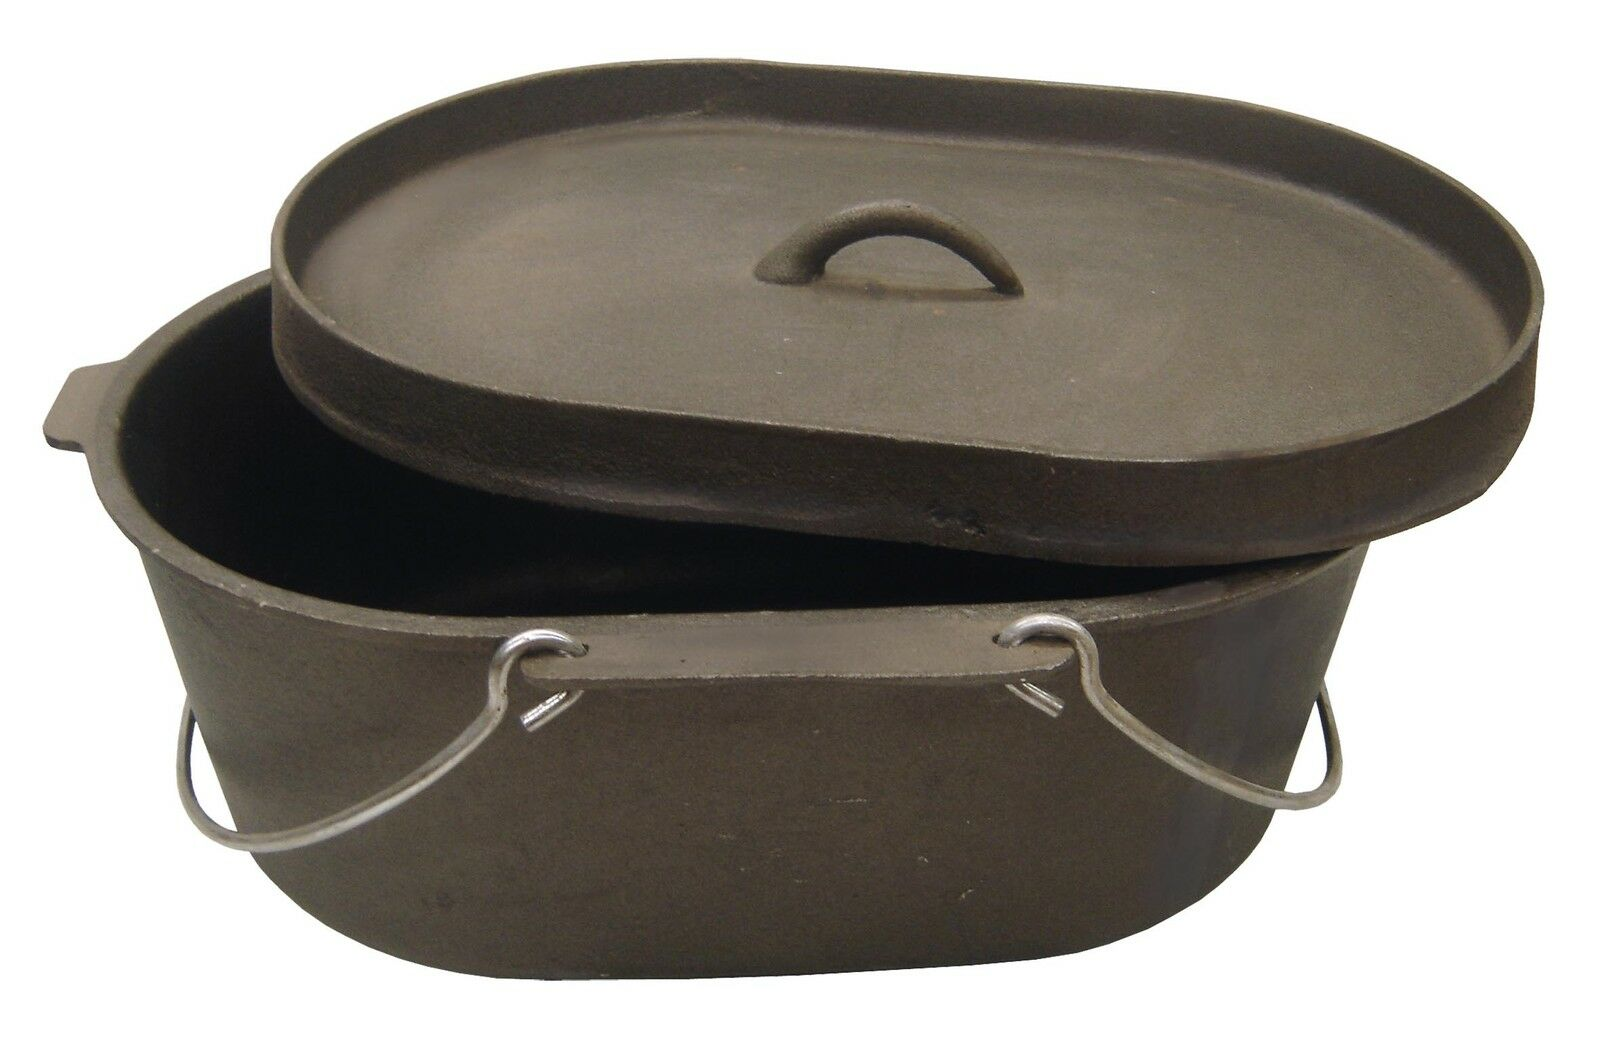 Oval 9 quart heavy duty cast iron dutch camp oven cooking for Cast iron dutch oven camping recipes